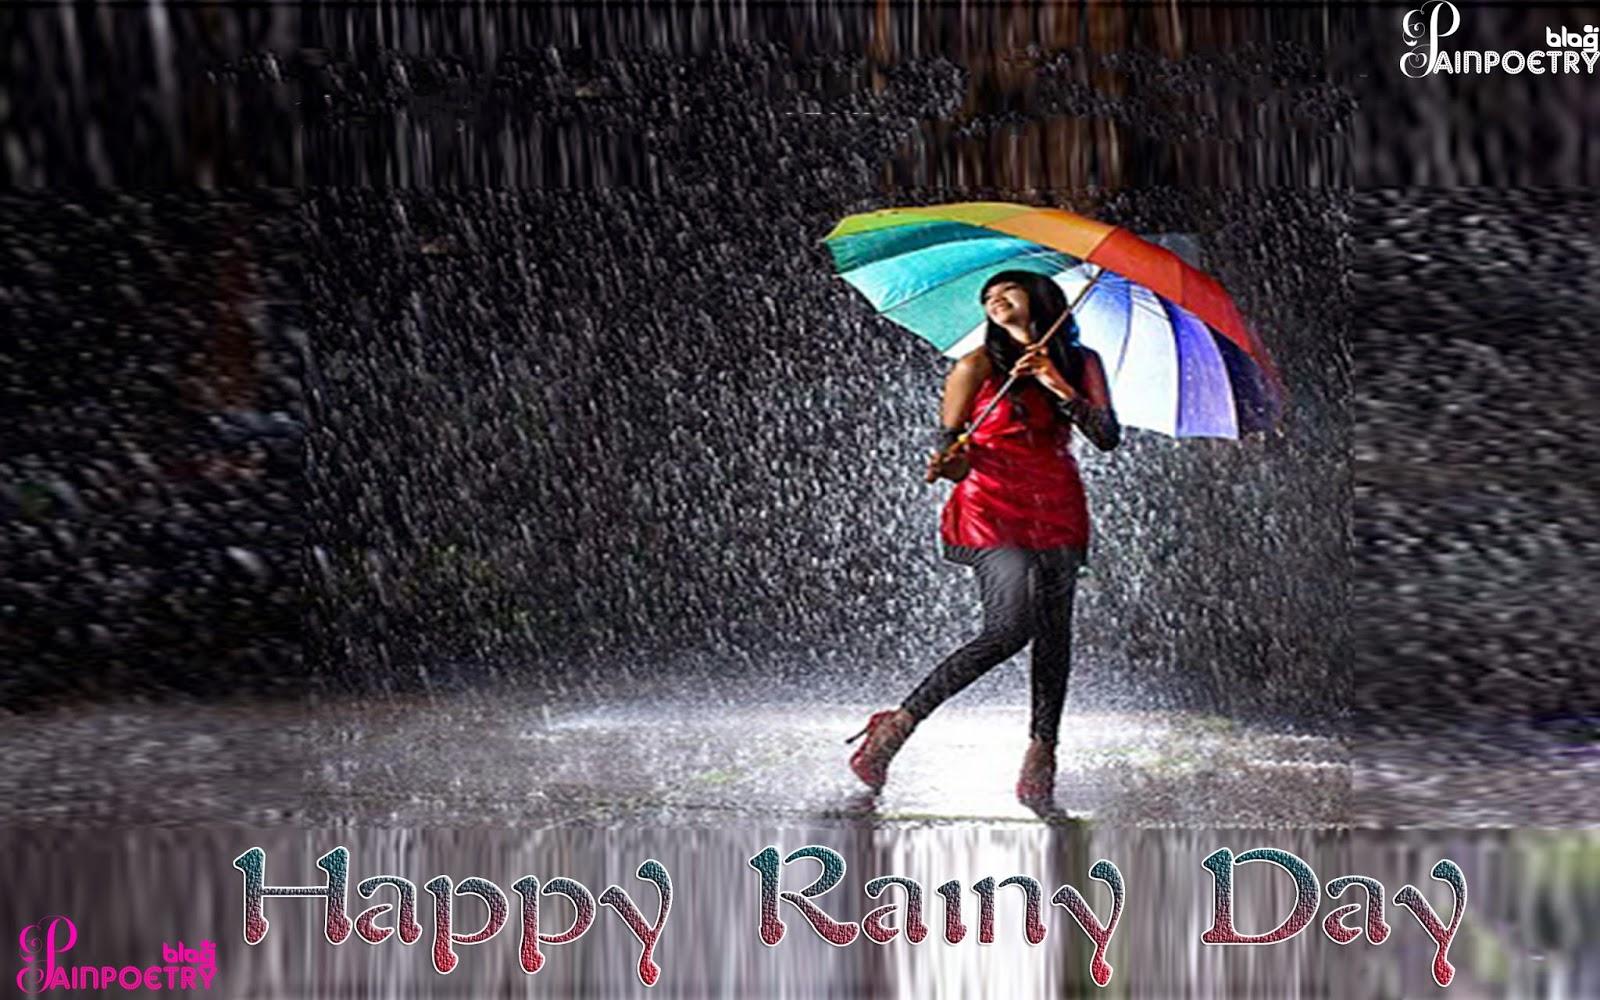 Happy rainy day sms and pic 2017 kashifmalikzone happy rainy day sms and pic 2017 m4hsunfo